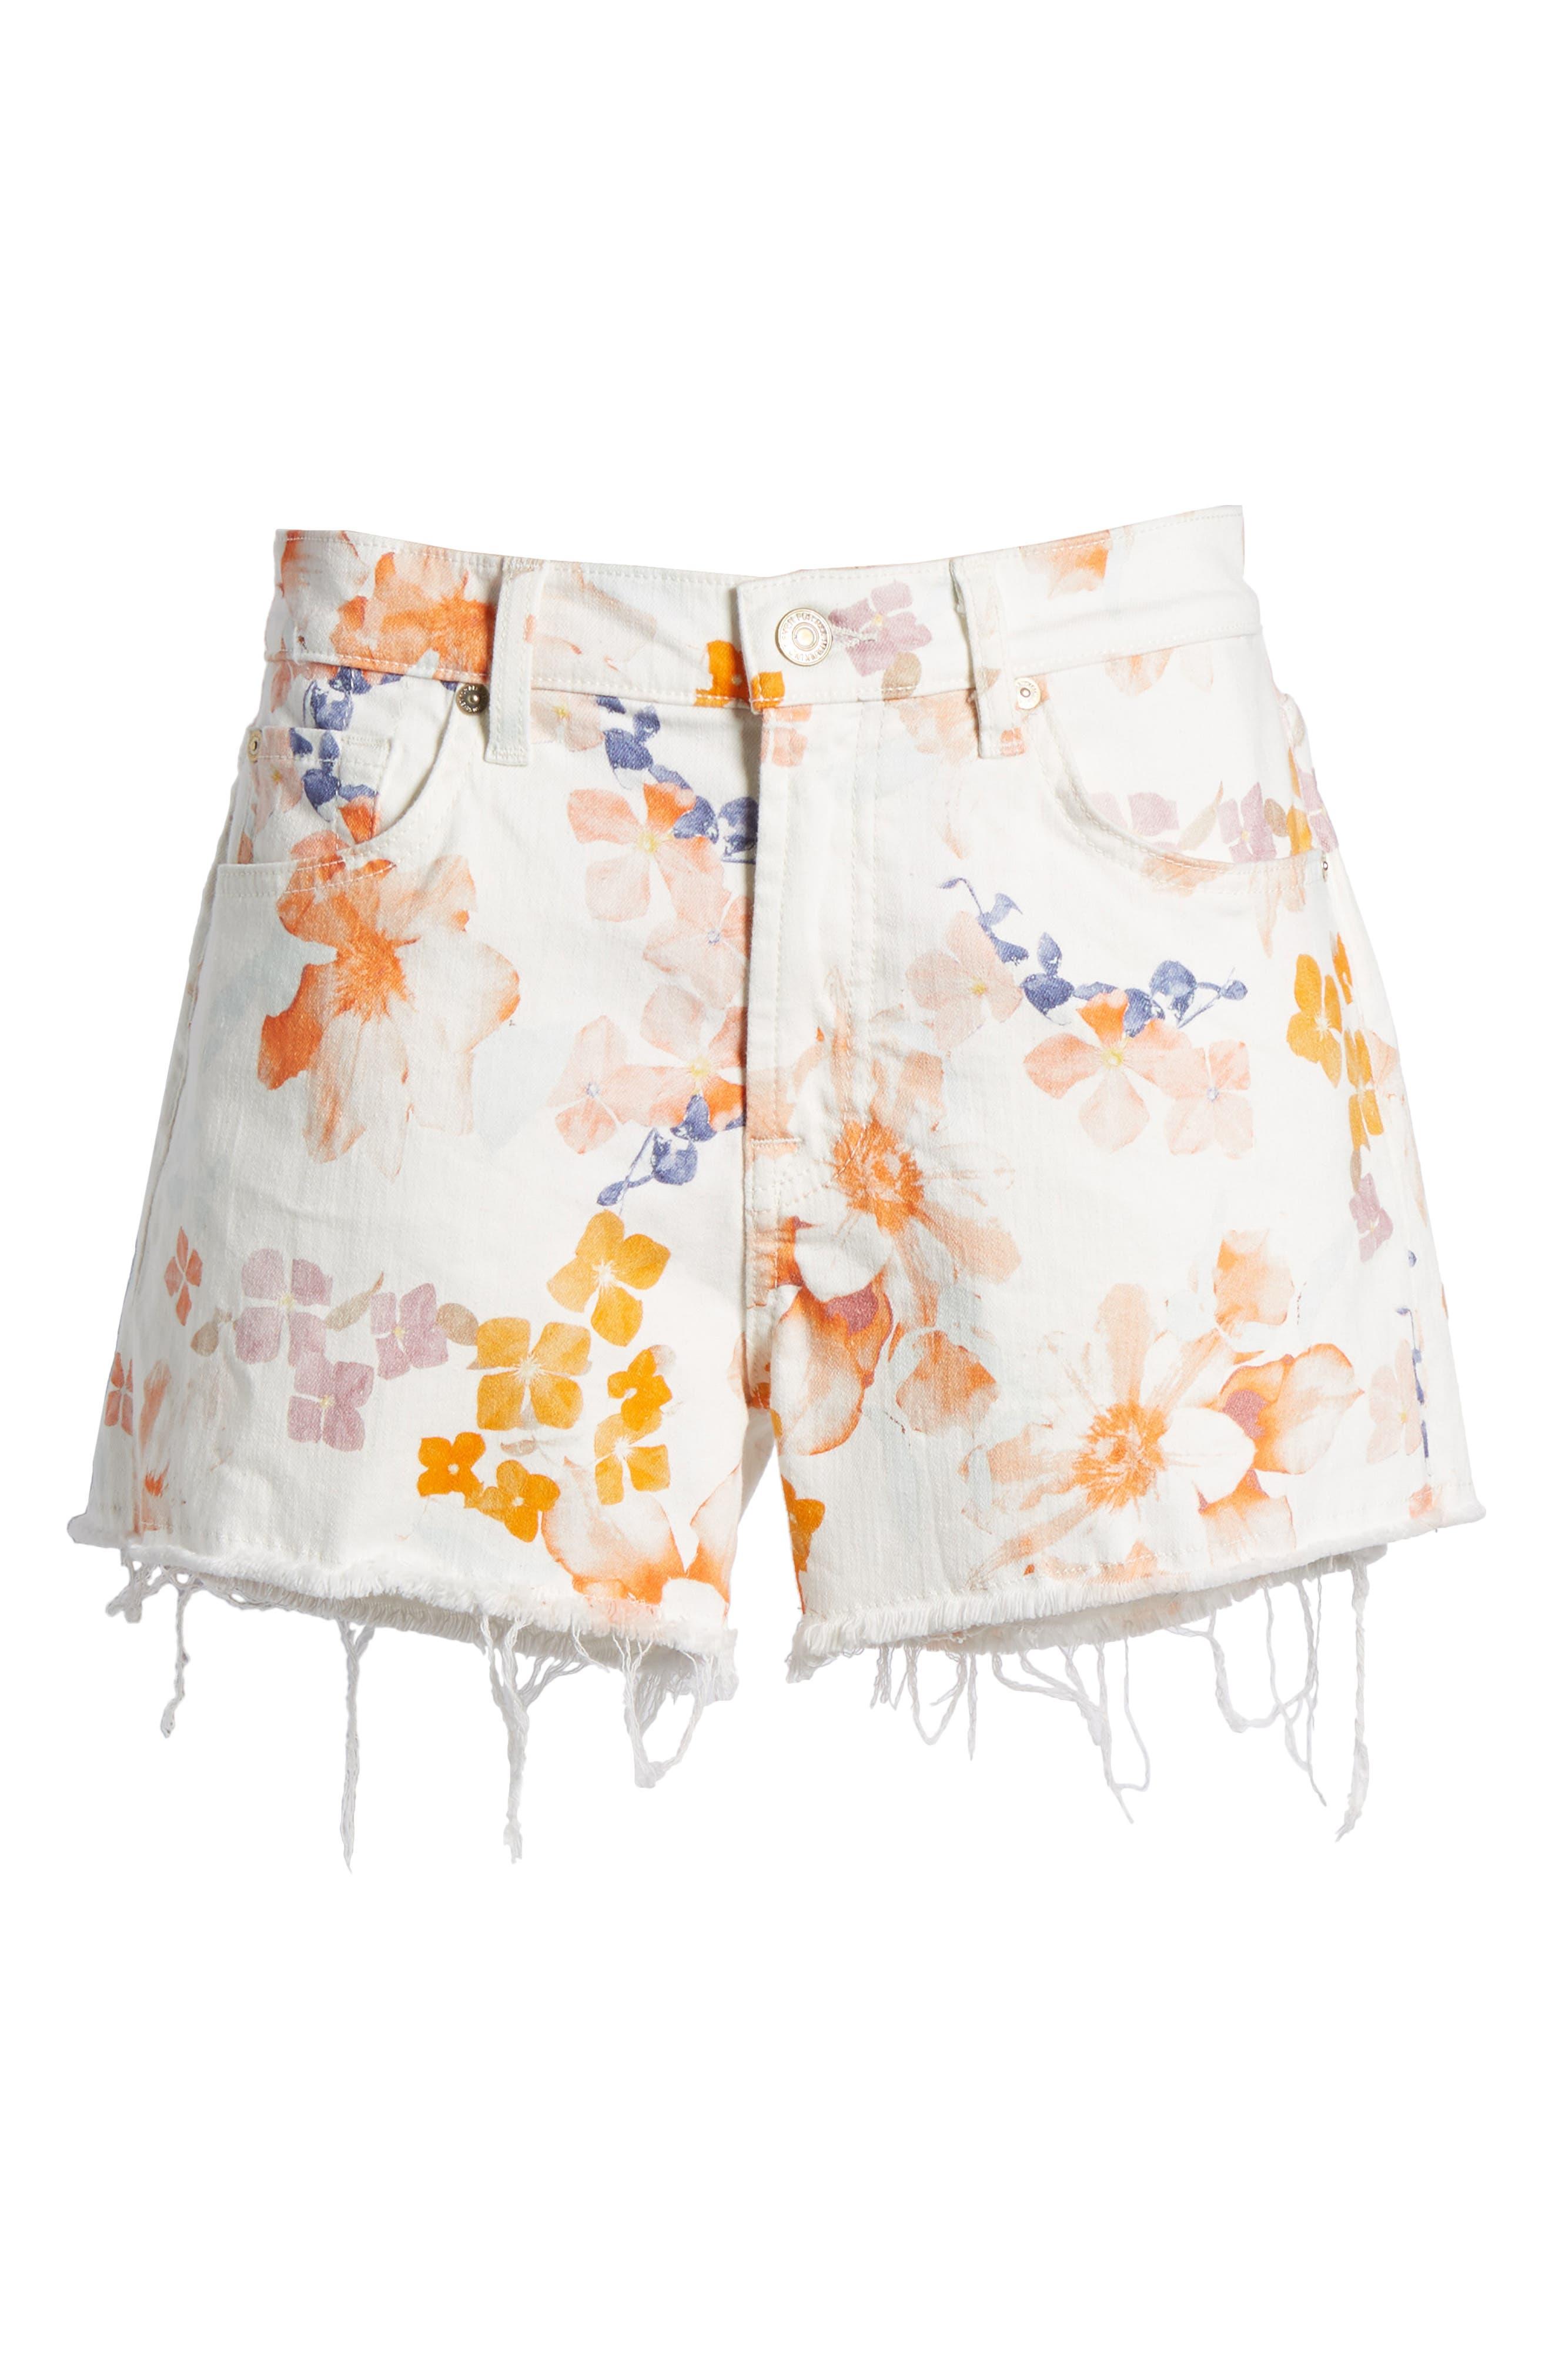 Cutoff Denim Shorts,                             Alternate thumbnail 7, color,                             651